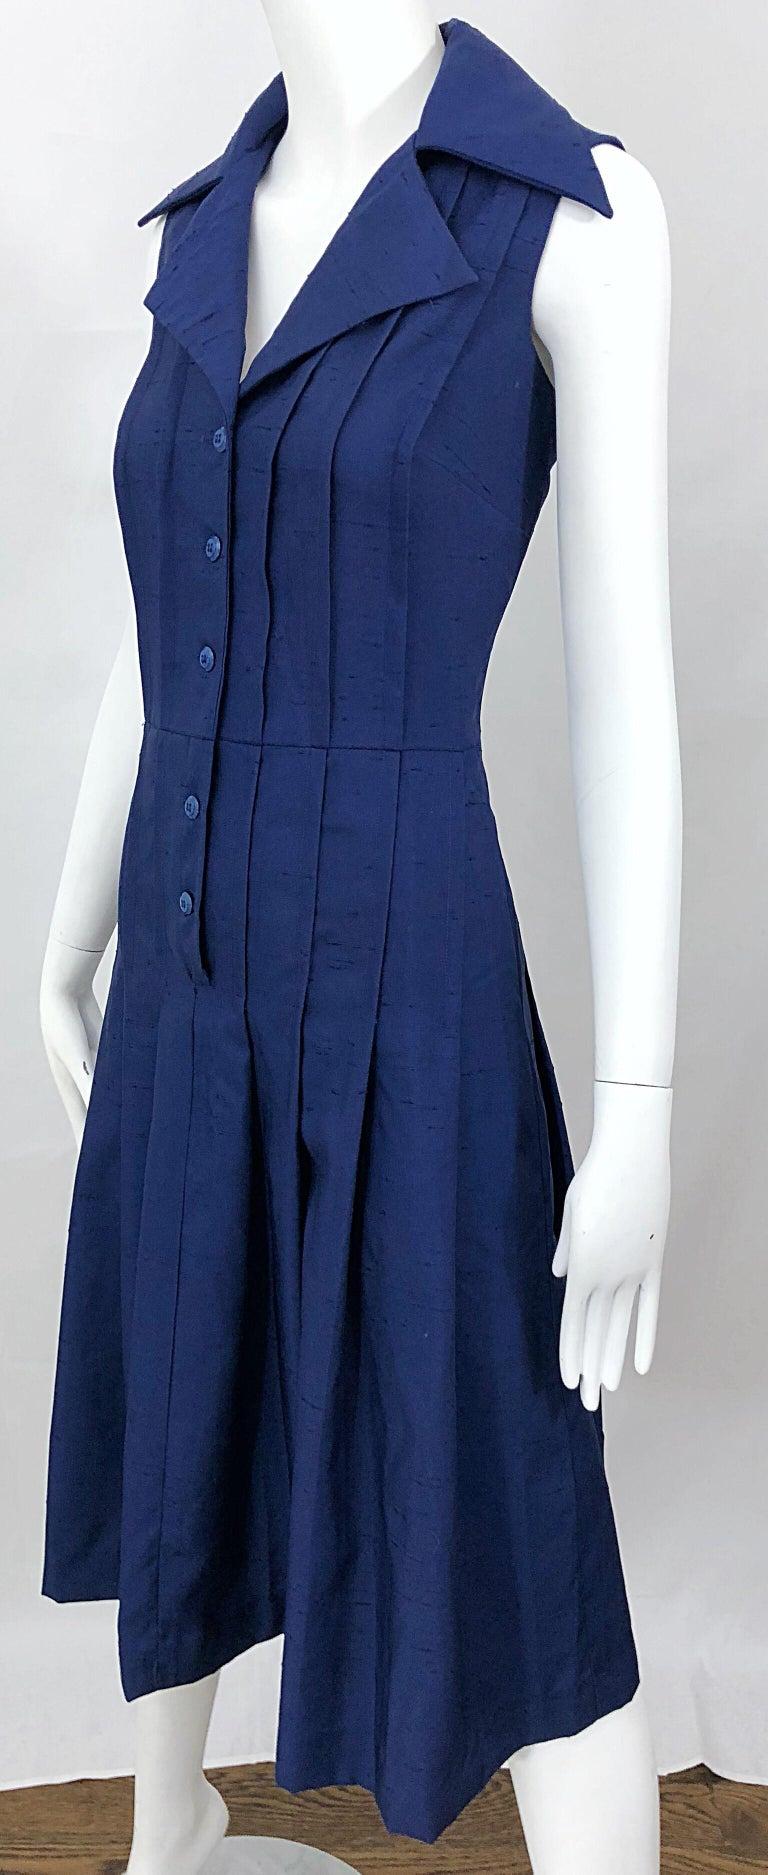 1990s Saks 5th Avenue Size 10 Navy Blue Silk Vintage 90s Sleeveless Shirt Dress For Sale 3